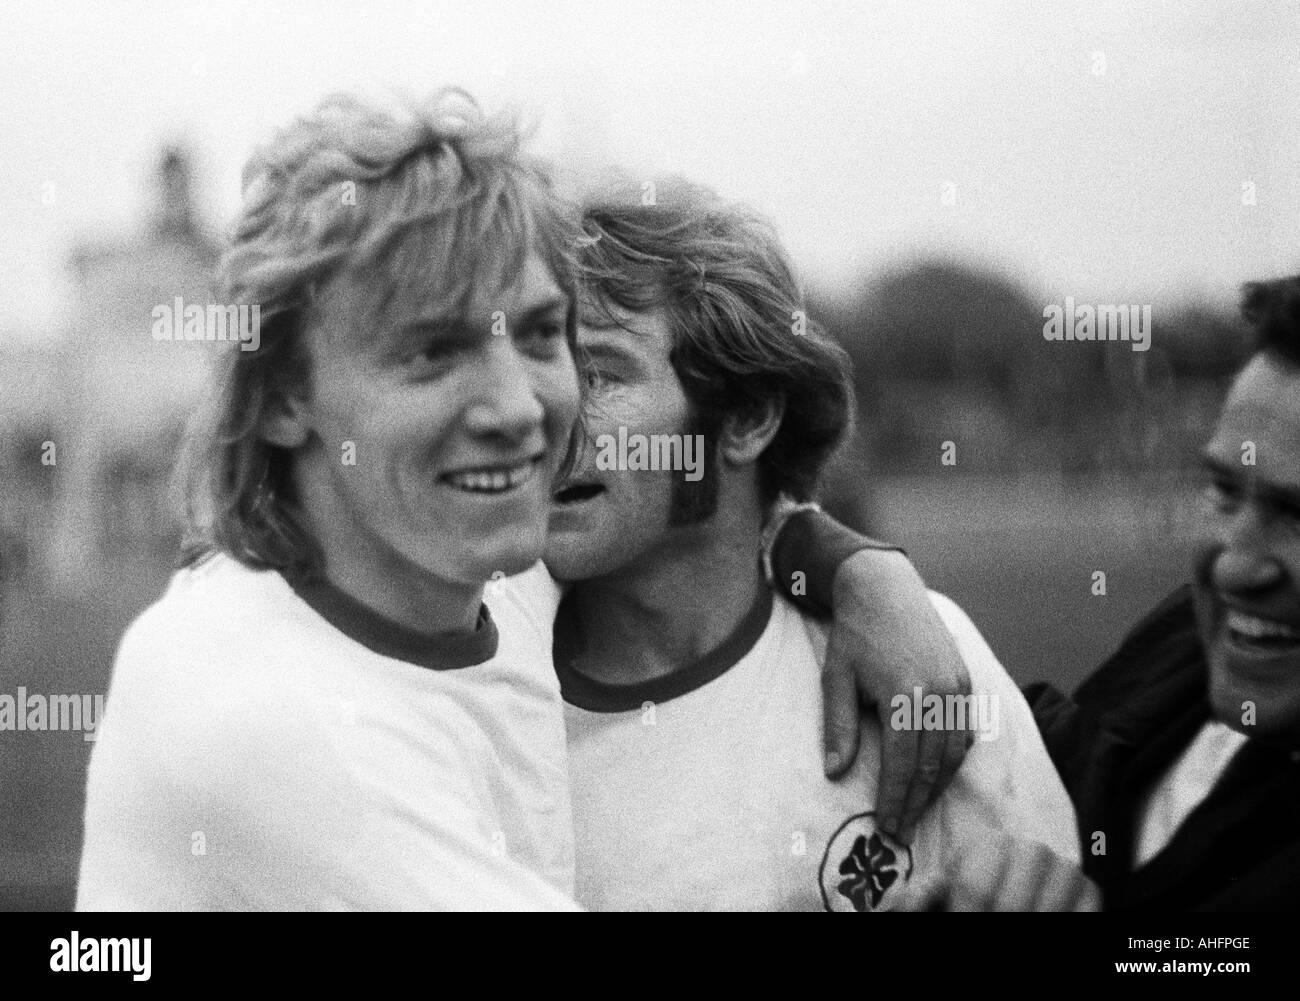 football, Bundesliga, 1972/1973, Rot-Weiss Oberhausen versus Eintracht Frankfurt 1:0, Niederrhein Stadium in Oberhausen, football players rejoicing, left Jupp Tenhagen (RWO), right Willi Mumme (RWO) - Stock Image